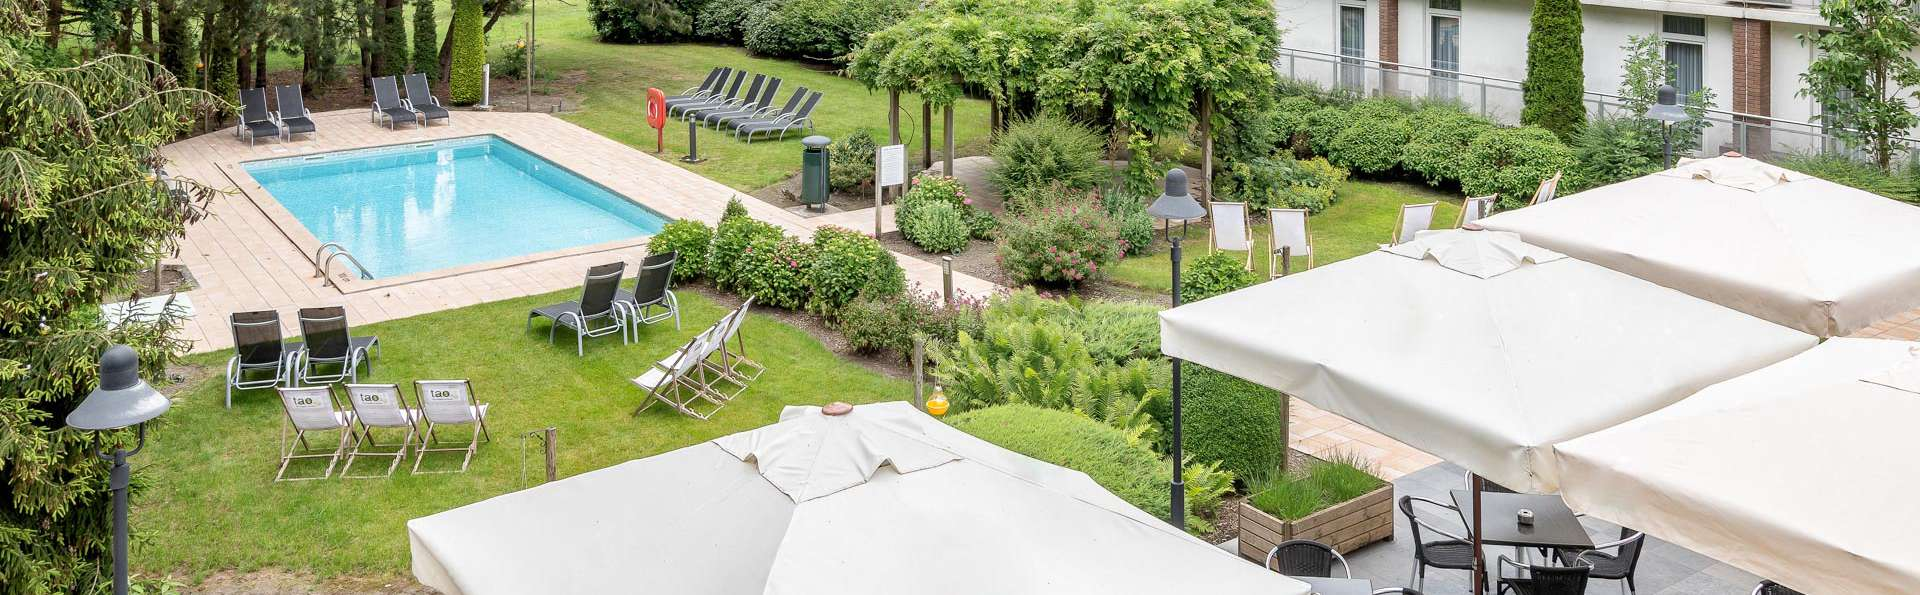 Green Park Hotel Brugge - EDIT_POOL_02.jpg